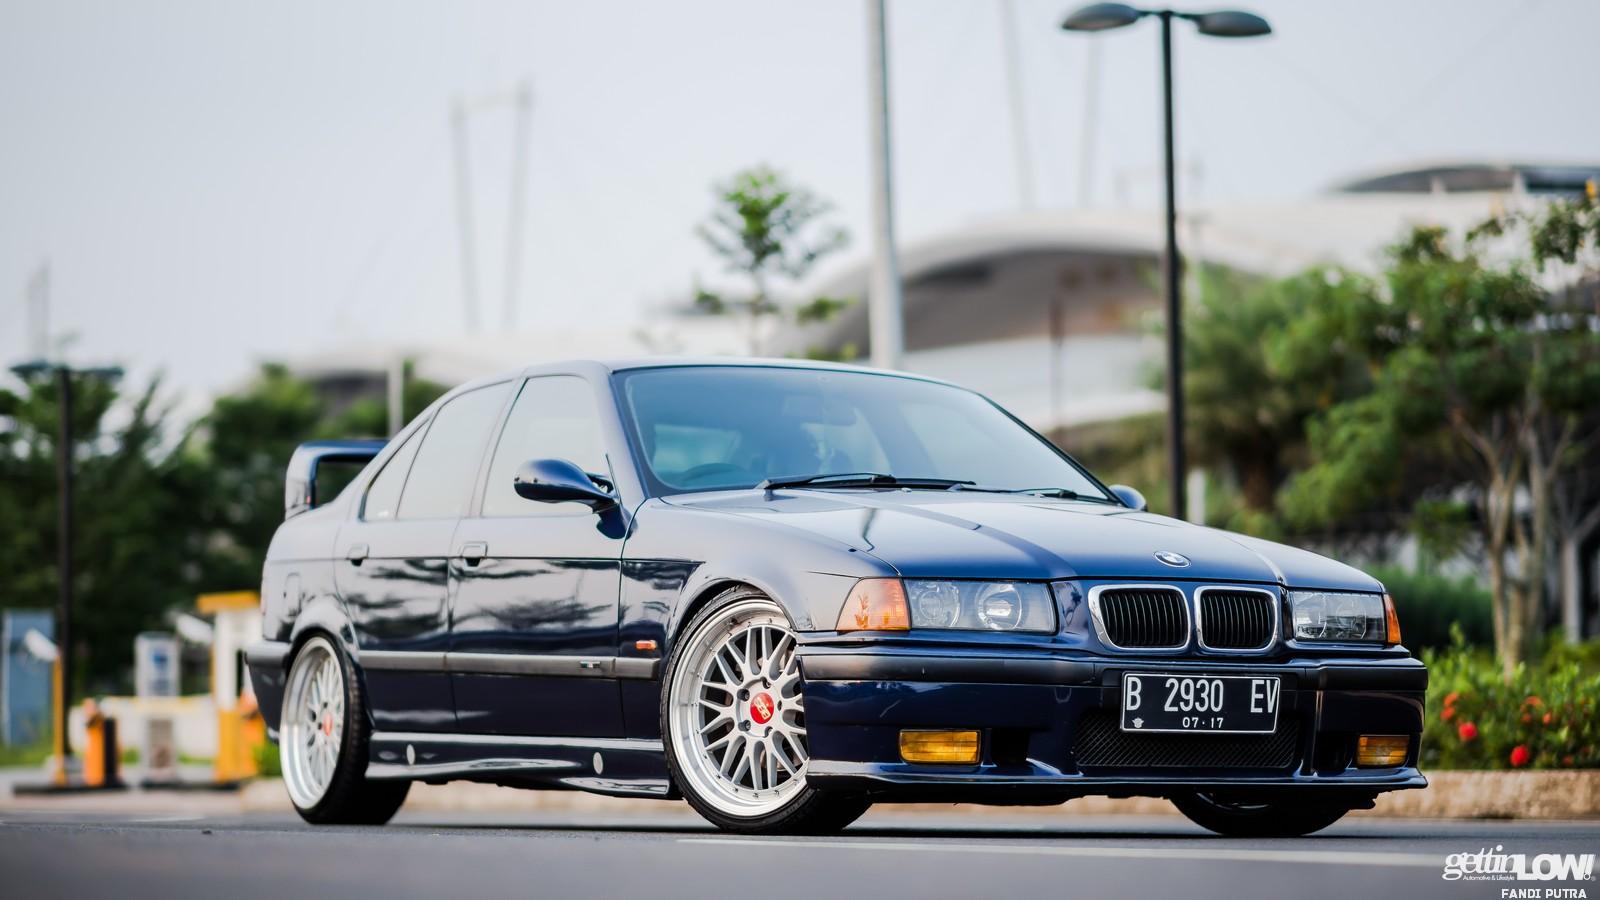 Ozza Ramadhan BMW E36-323i 1997